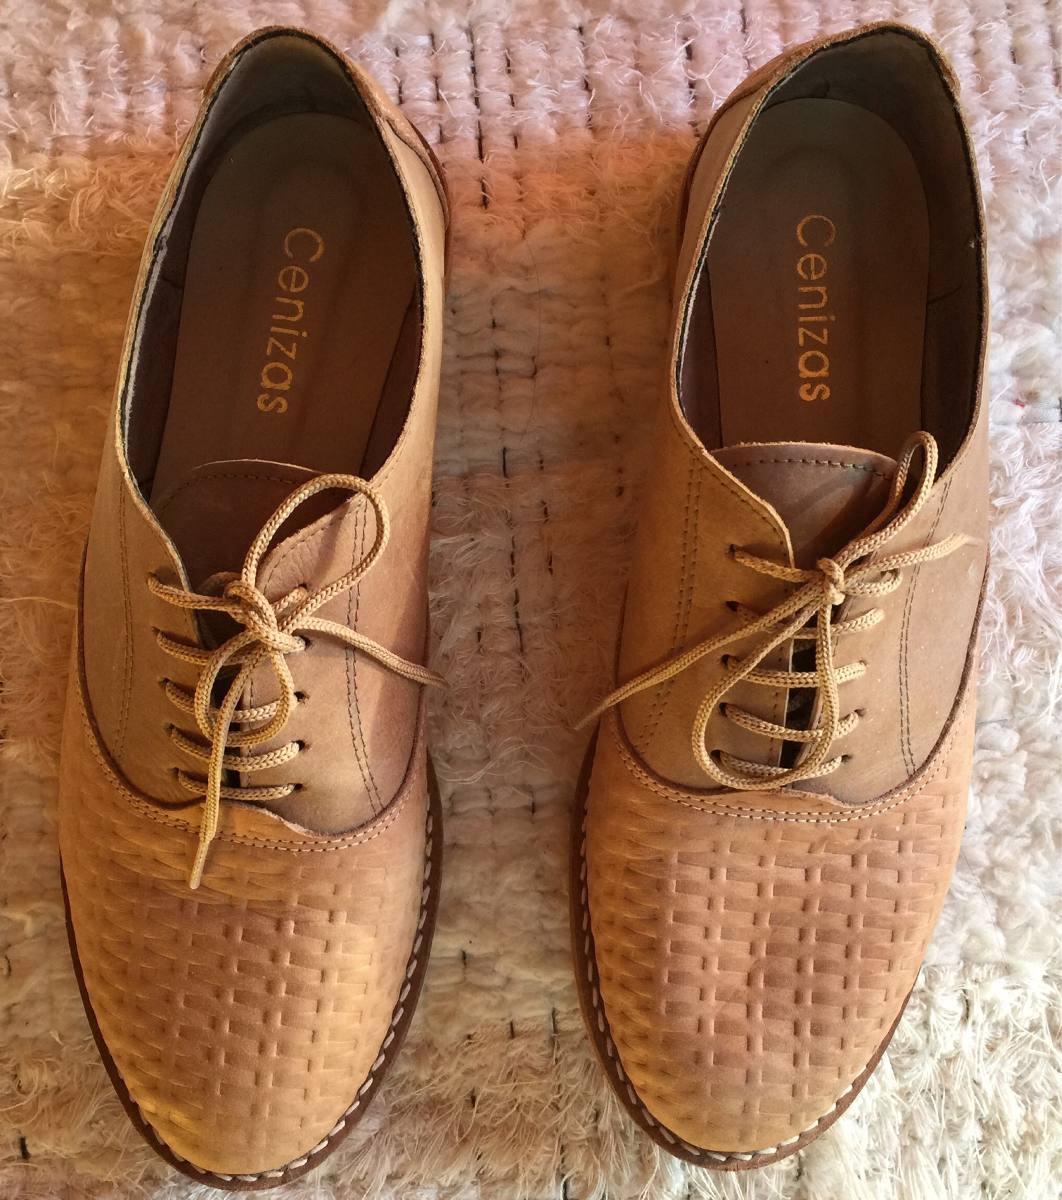 055018130 zapatos-mocasines-de-mujer-2017-D NQ NP 662328-MLA25870847535 082017-F.jpg